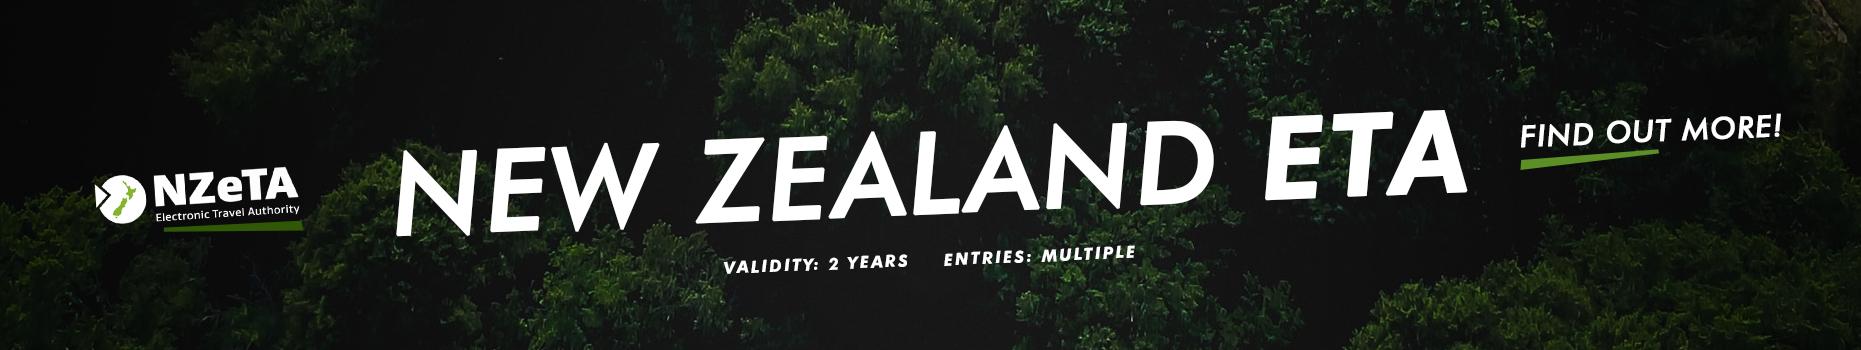 New Zealand ETA available on our website